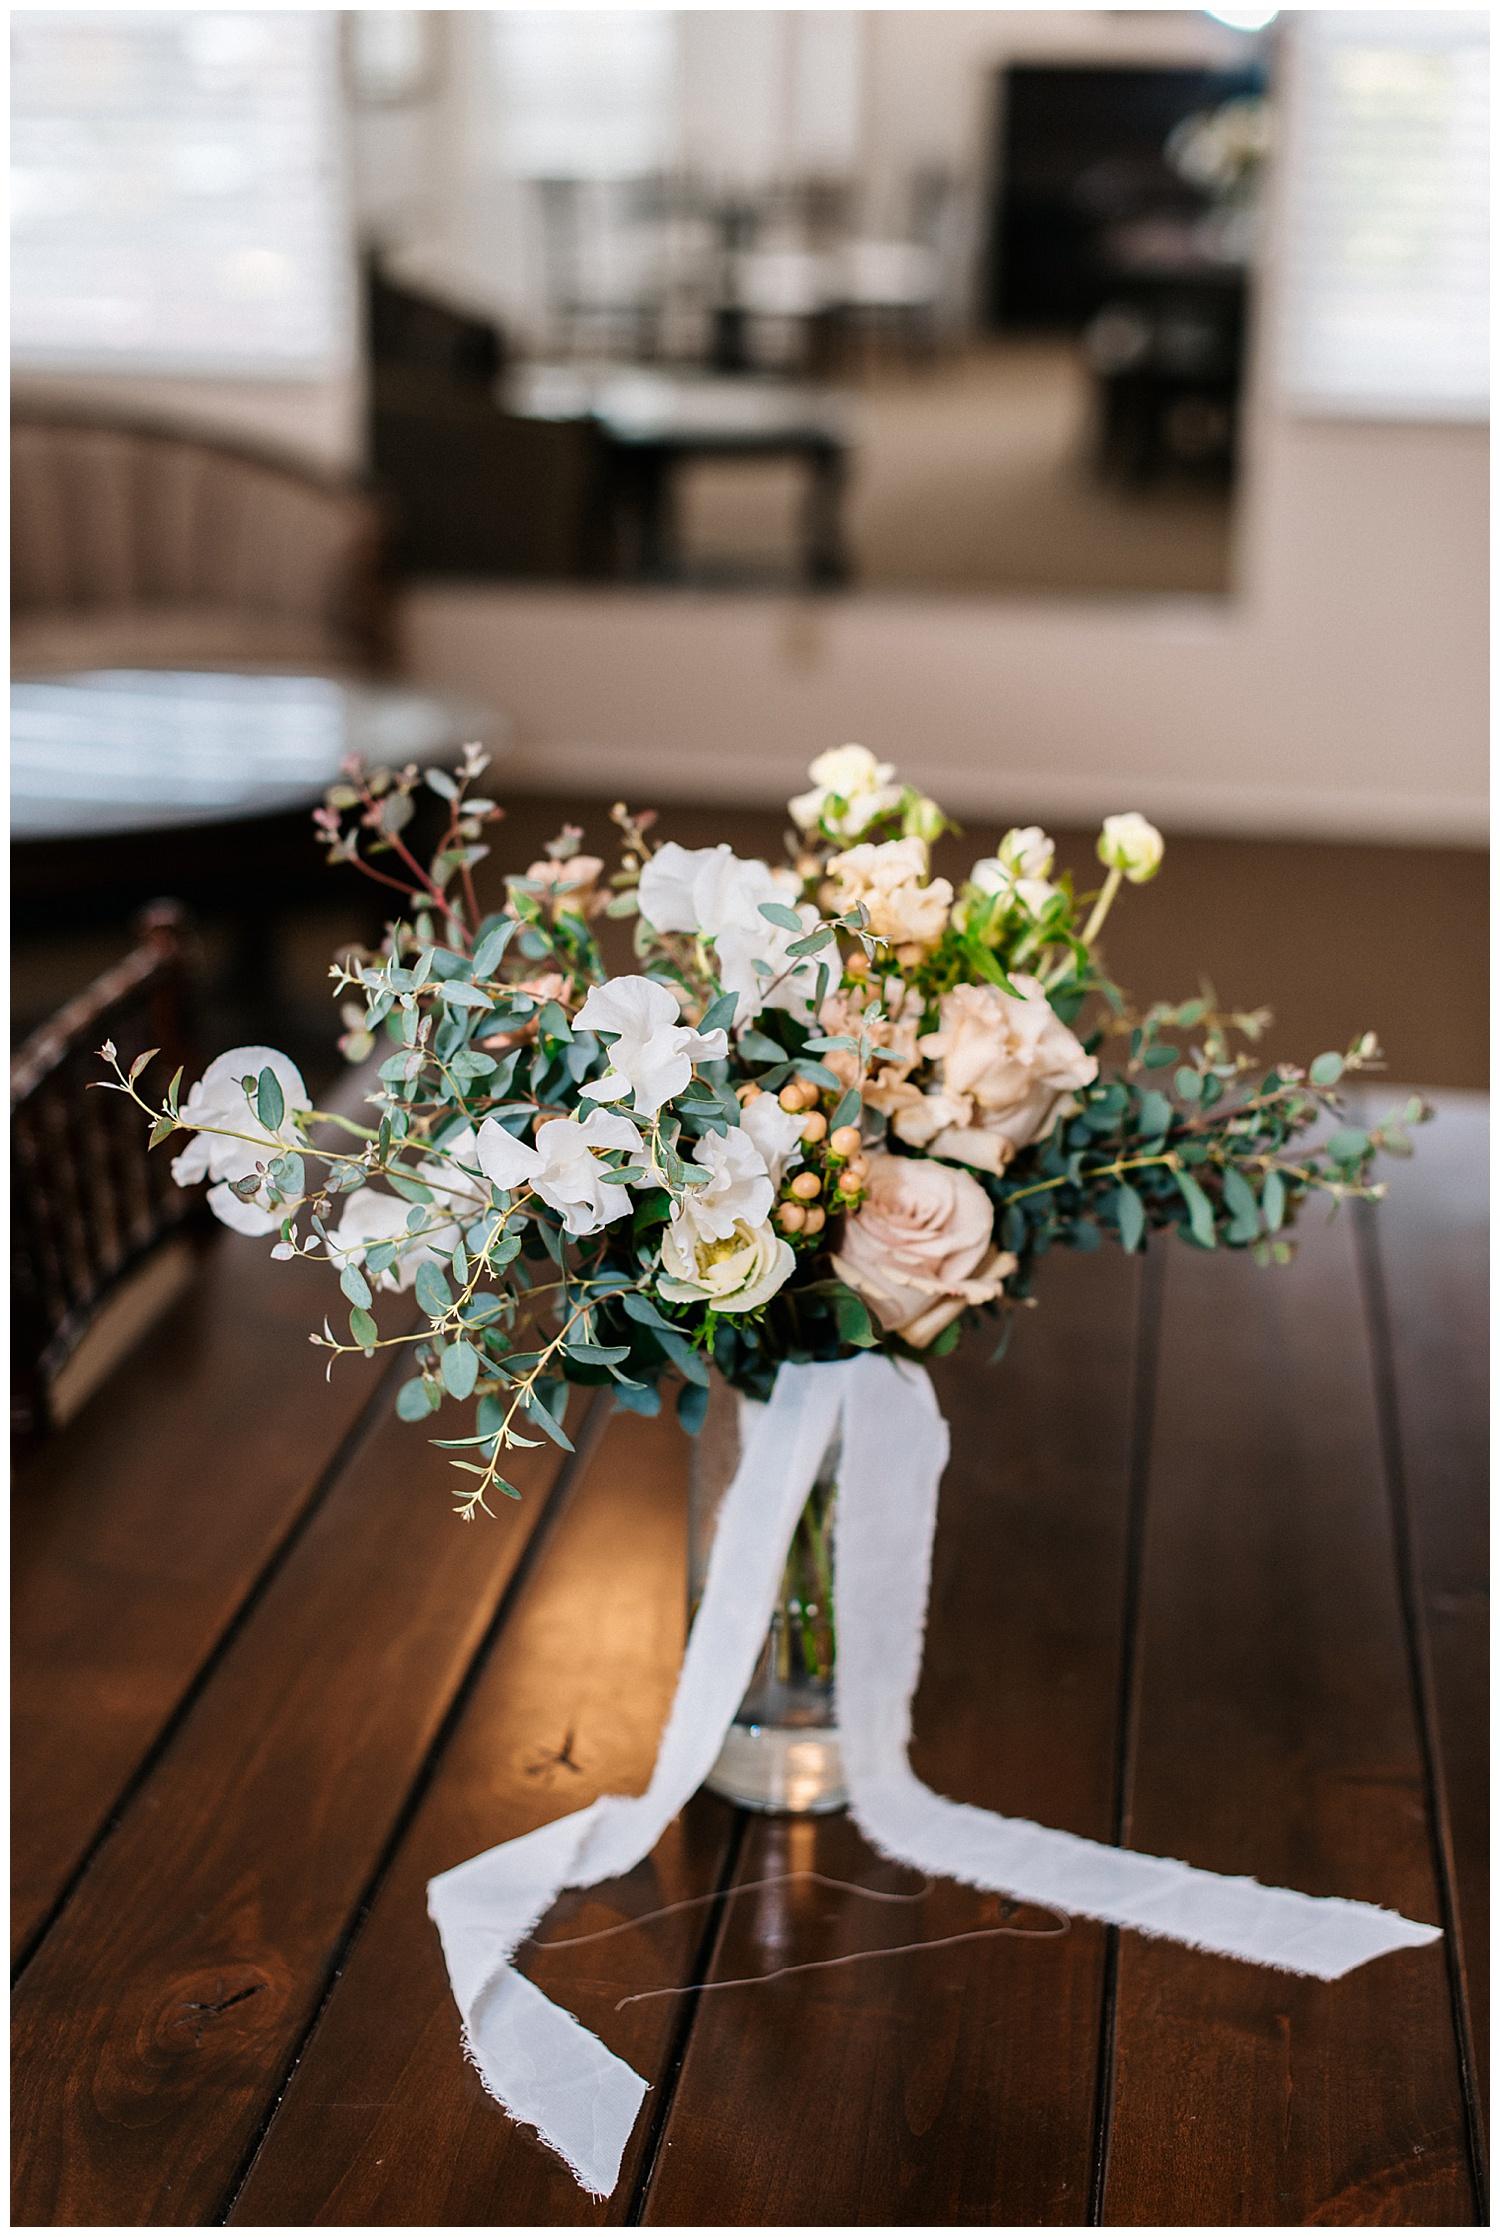 SamEricaStudios - San Diego Wedding Photographer - Galaxy Themed Rainy Day Wedding Parq West San Diego_0026.jpg